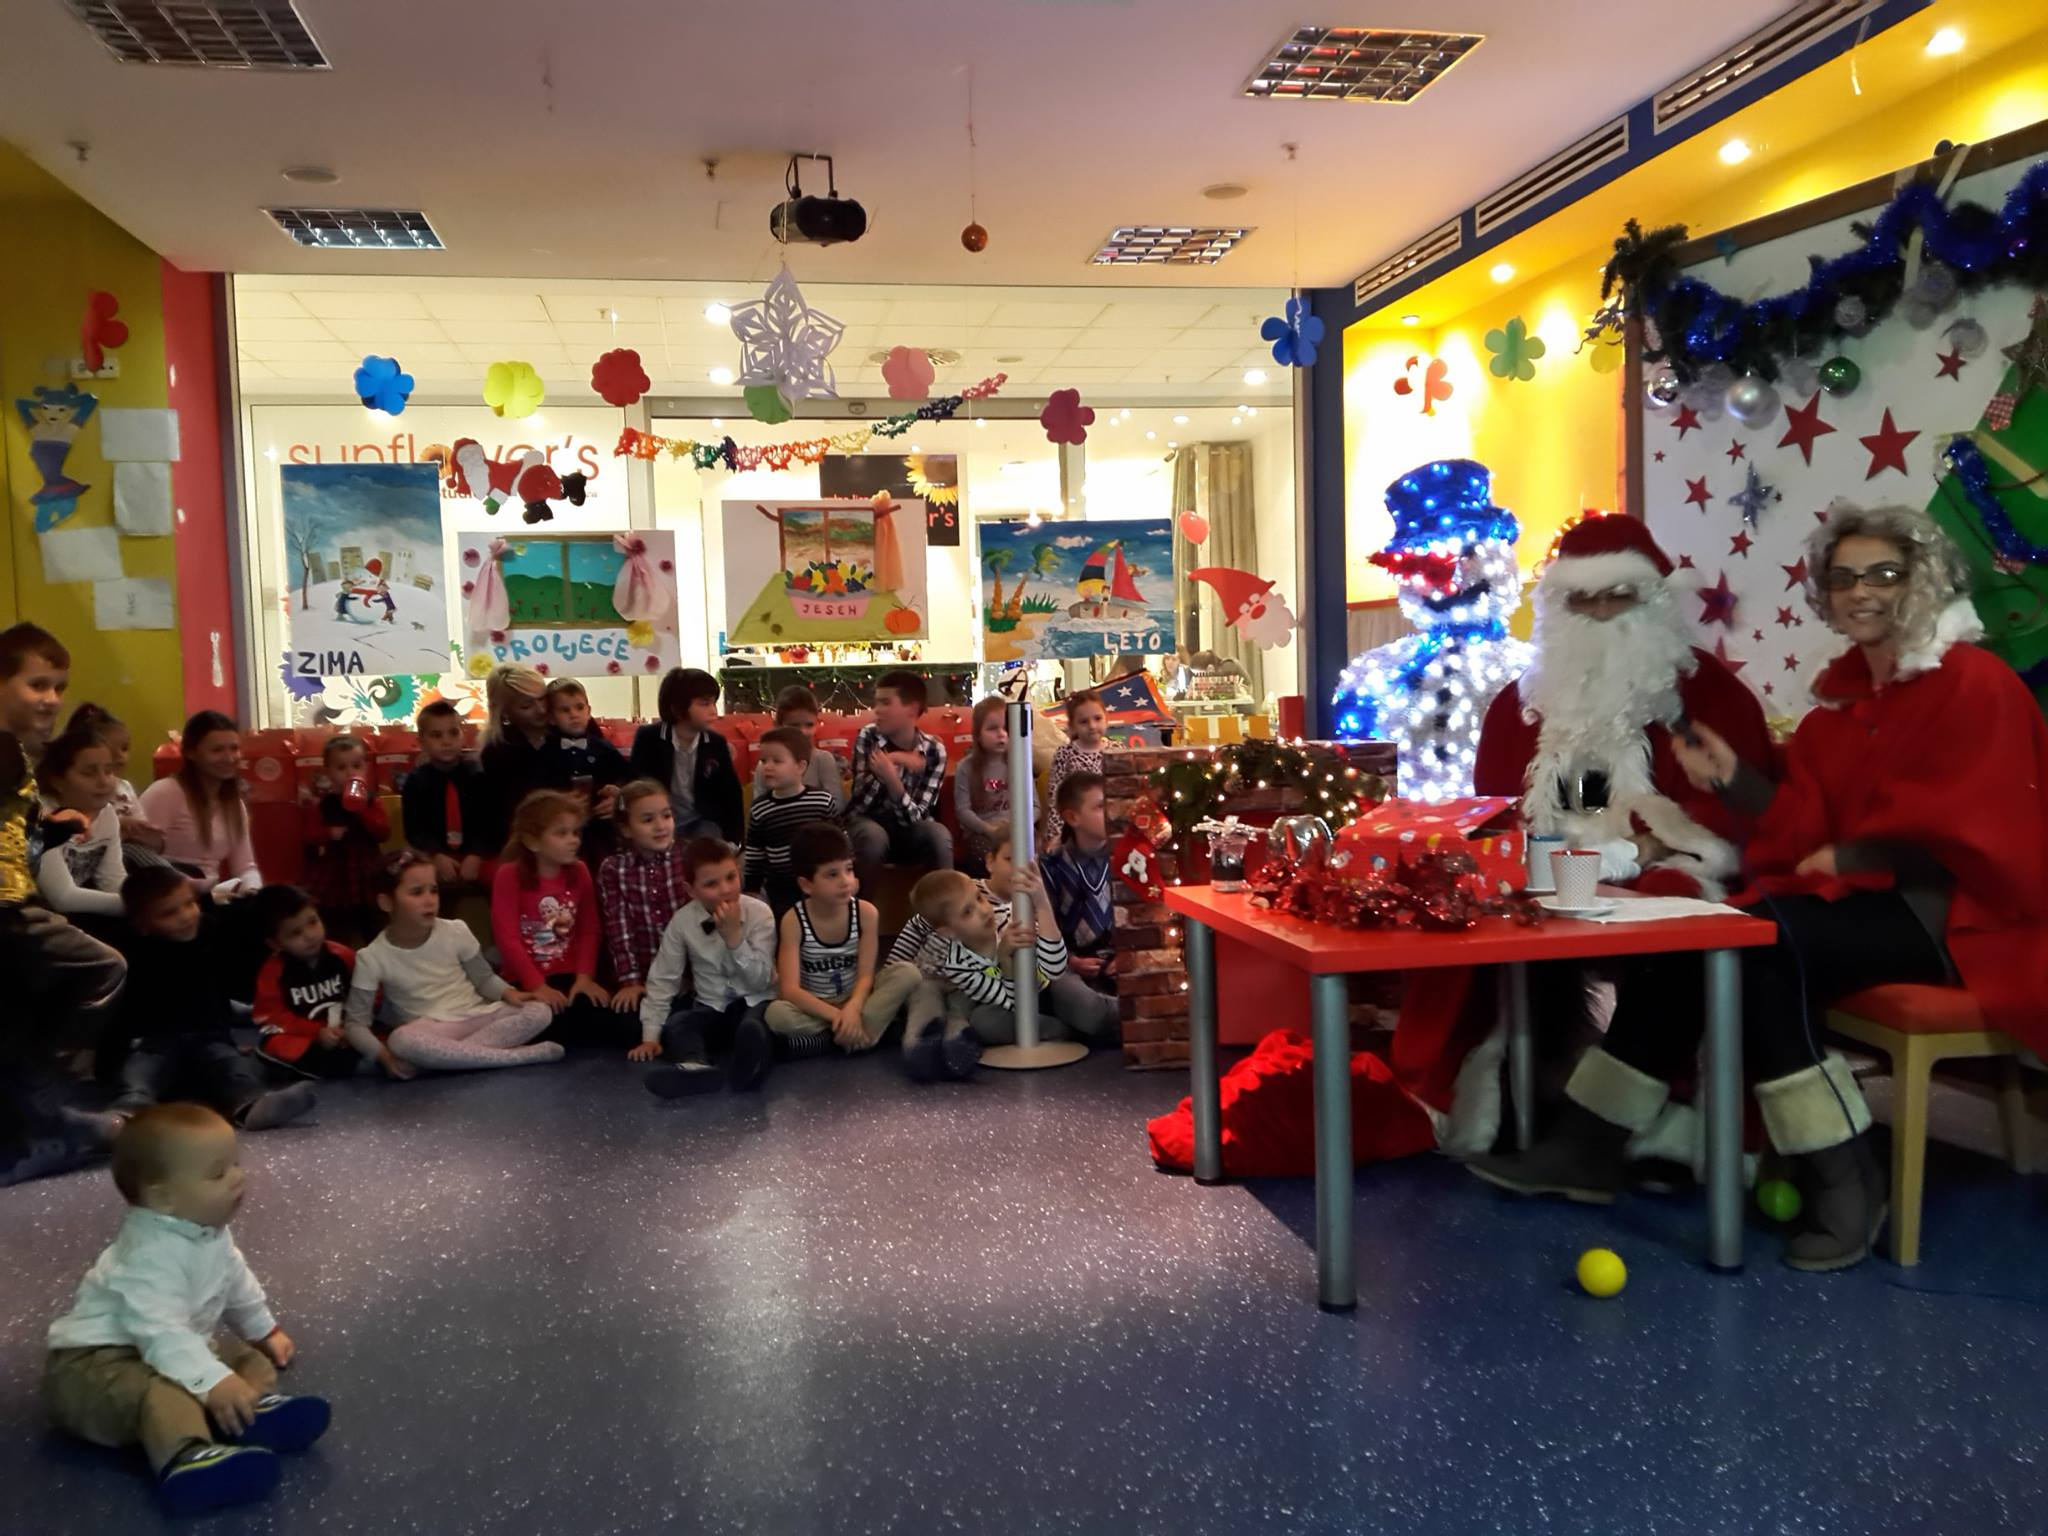 childrens-playroom-zum-zum-official-fb-page